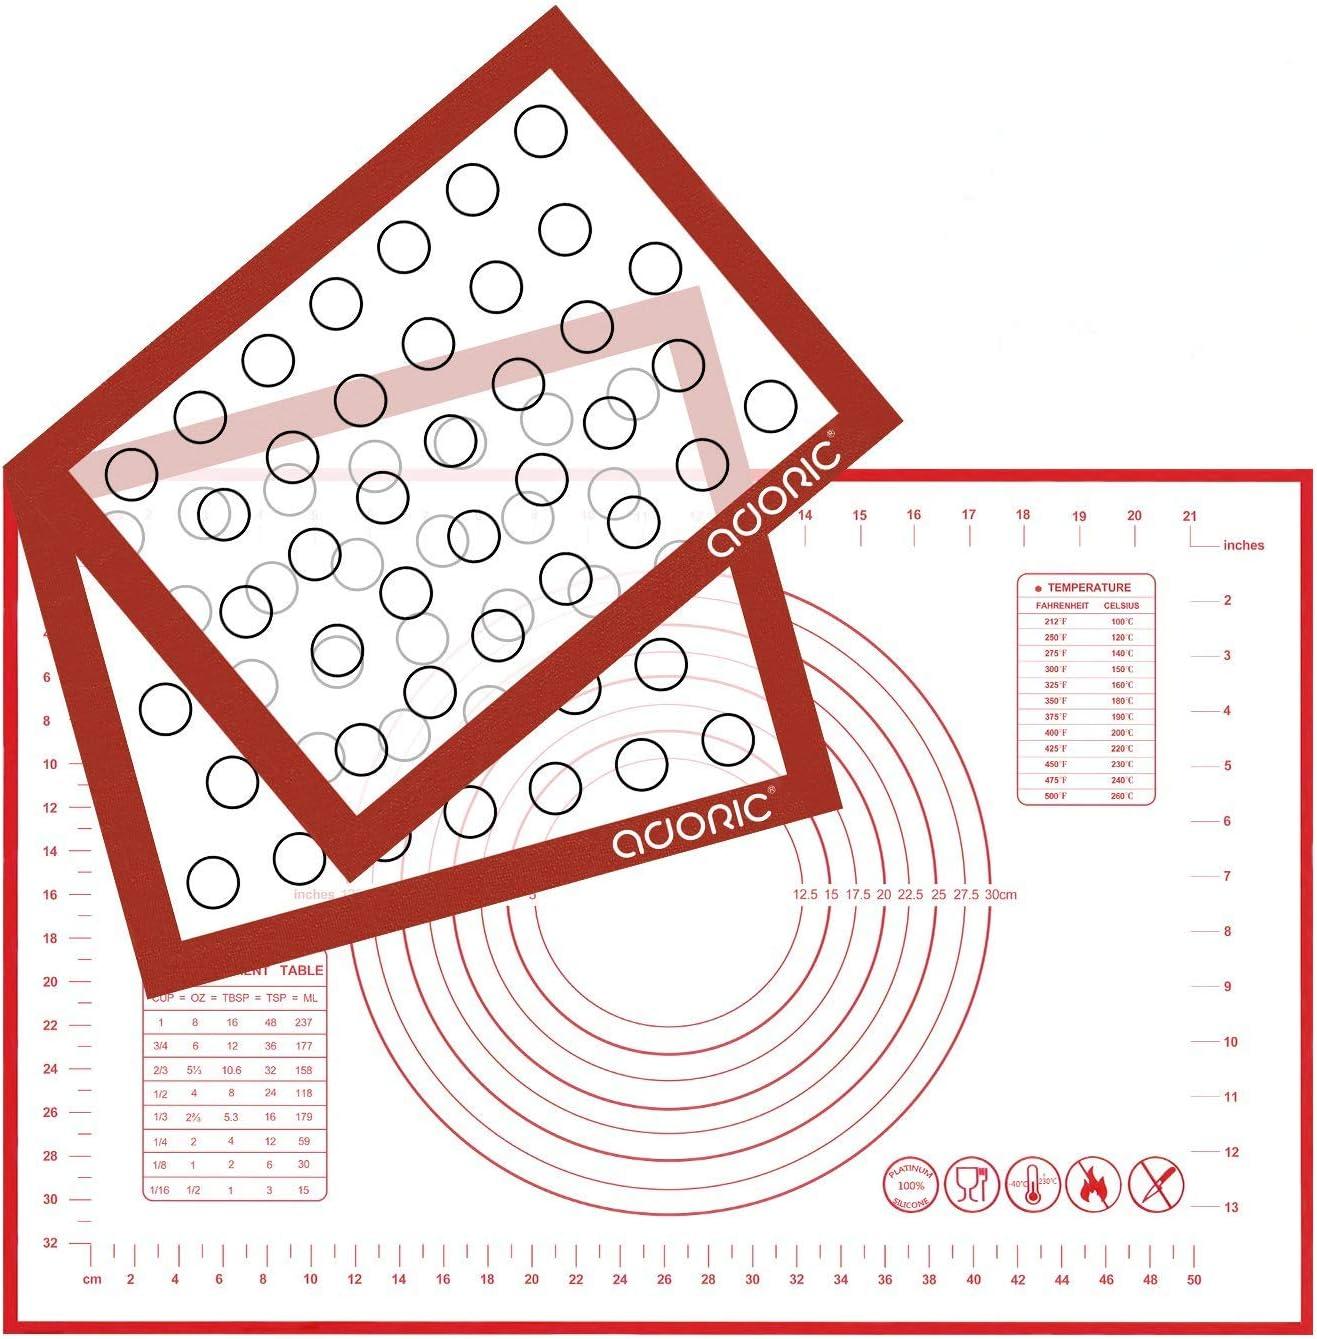 Silicone Baking Mats Pastry Mat, Adoric 2Pack Non-stick Baking Mat and 1Pack 16x24 Inch Silicone Pastry Mat with Measurement Fondant Mat, Counter Mat, Dough Rolling Mat, Oven Liner, Pie Crust Mat